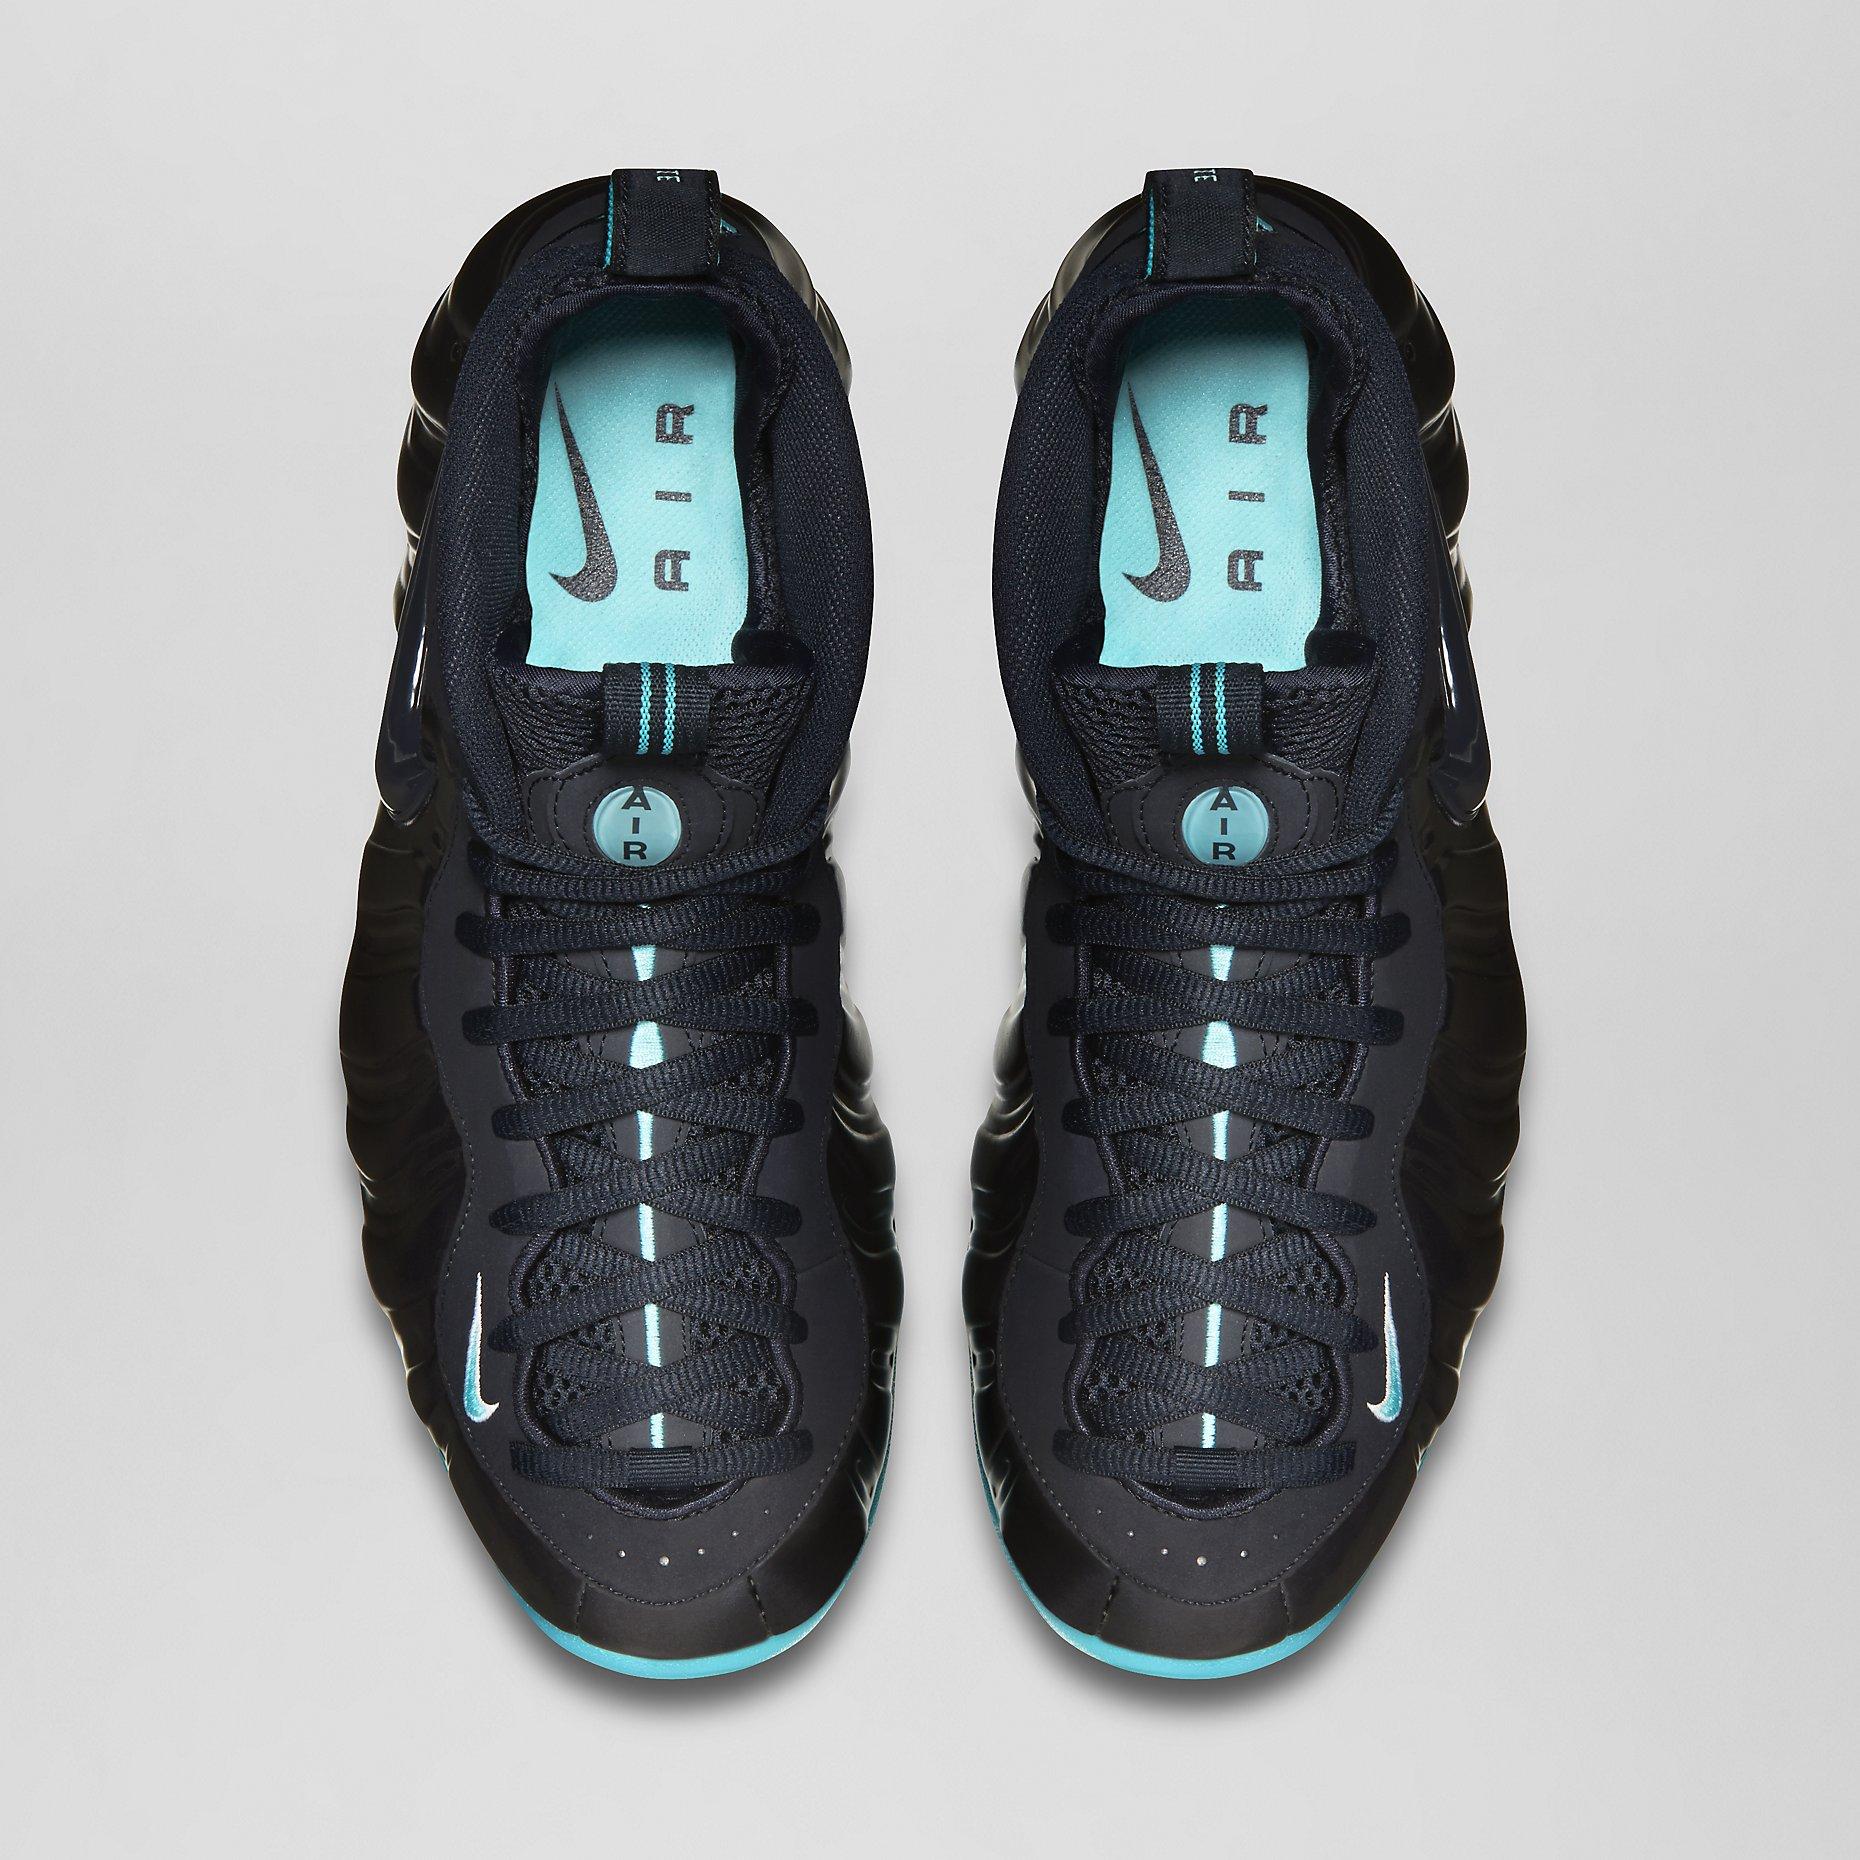 promo code 49a4a 36f11 Nike Air Foamposite Pro